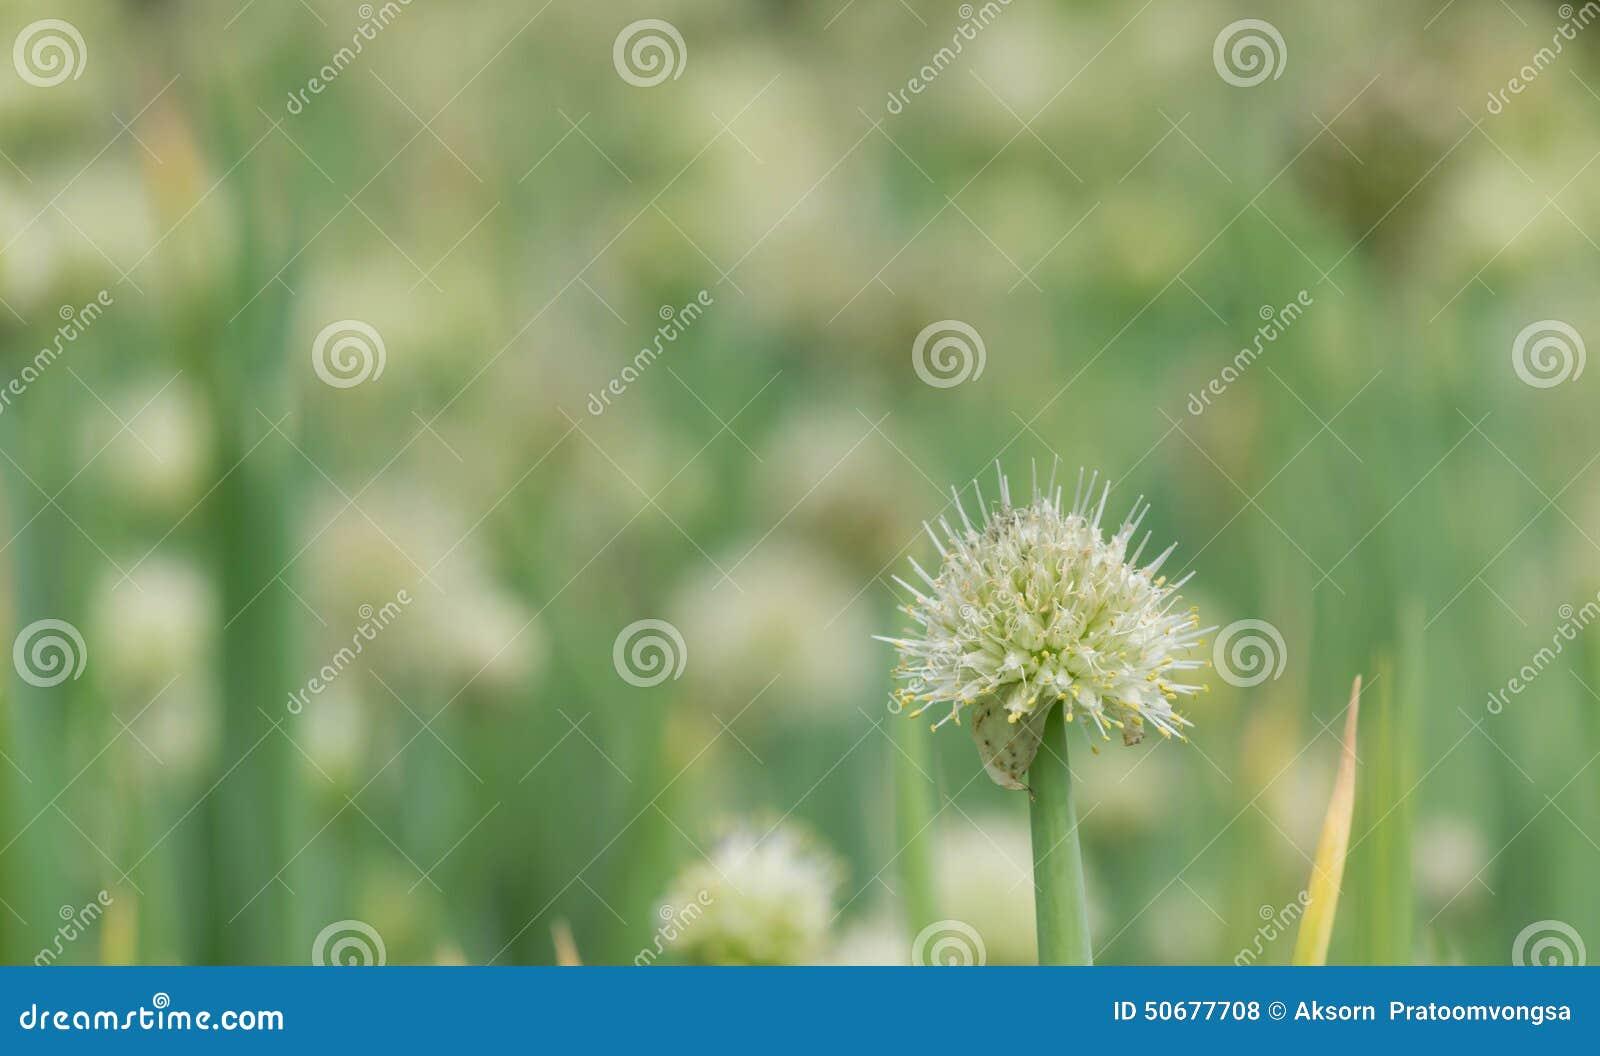 Download 葱花 库存照片. 图片 包括有 查出, 可口, 农场, 健康, 原始, 可食用, 开花, 绿色, 成份, 食物 - 50677708